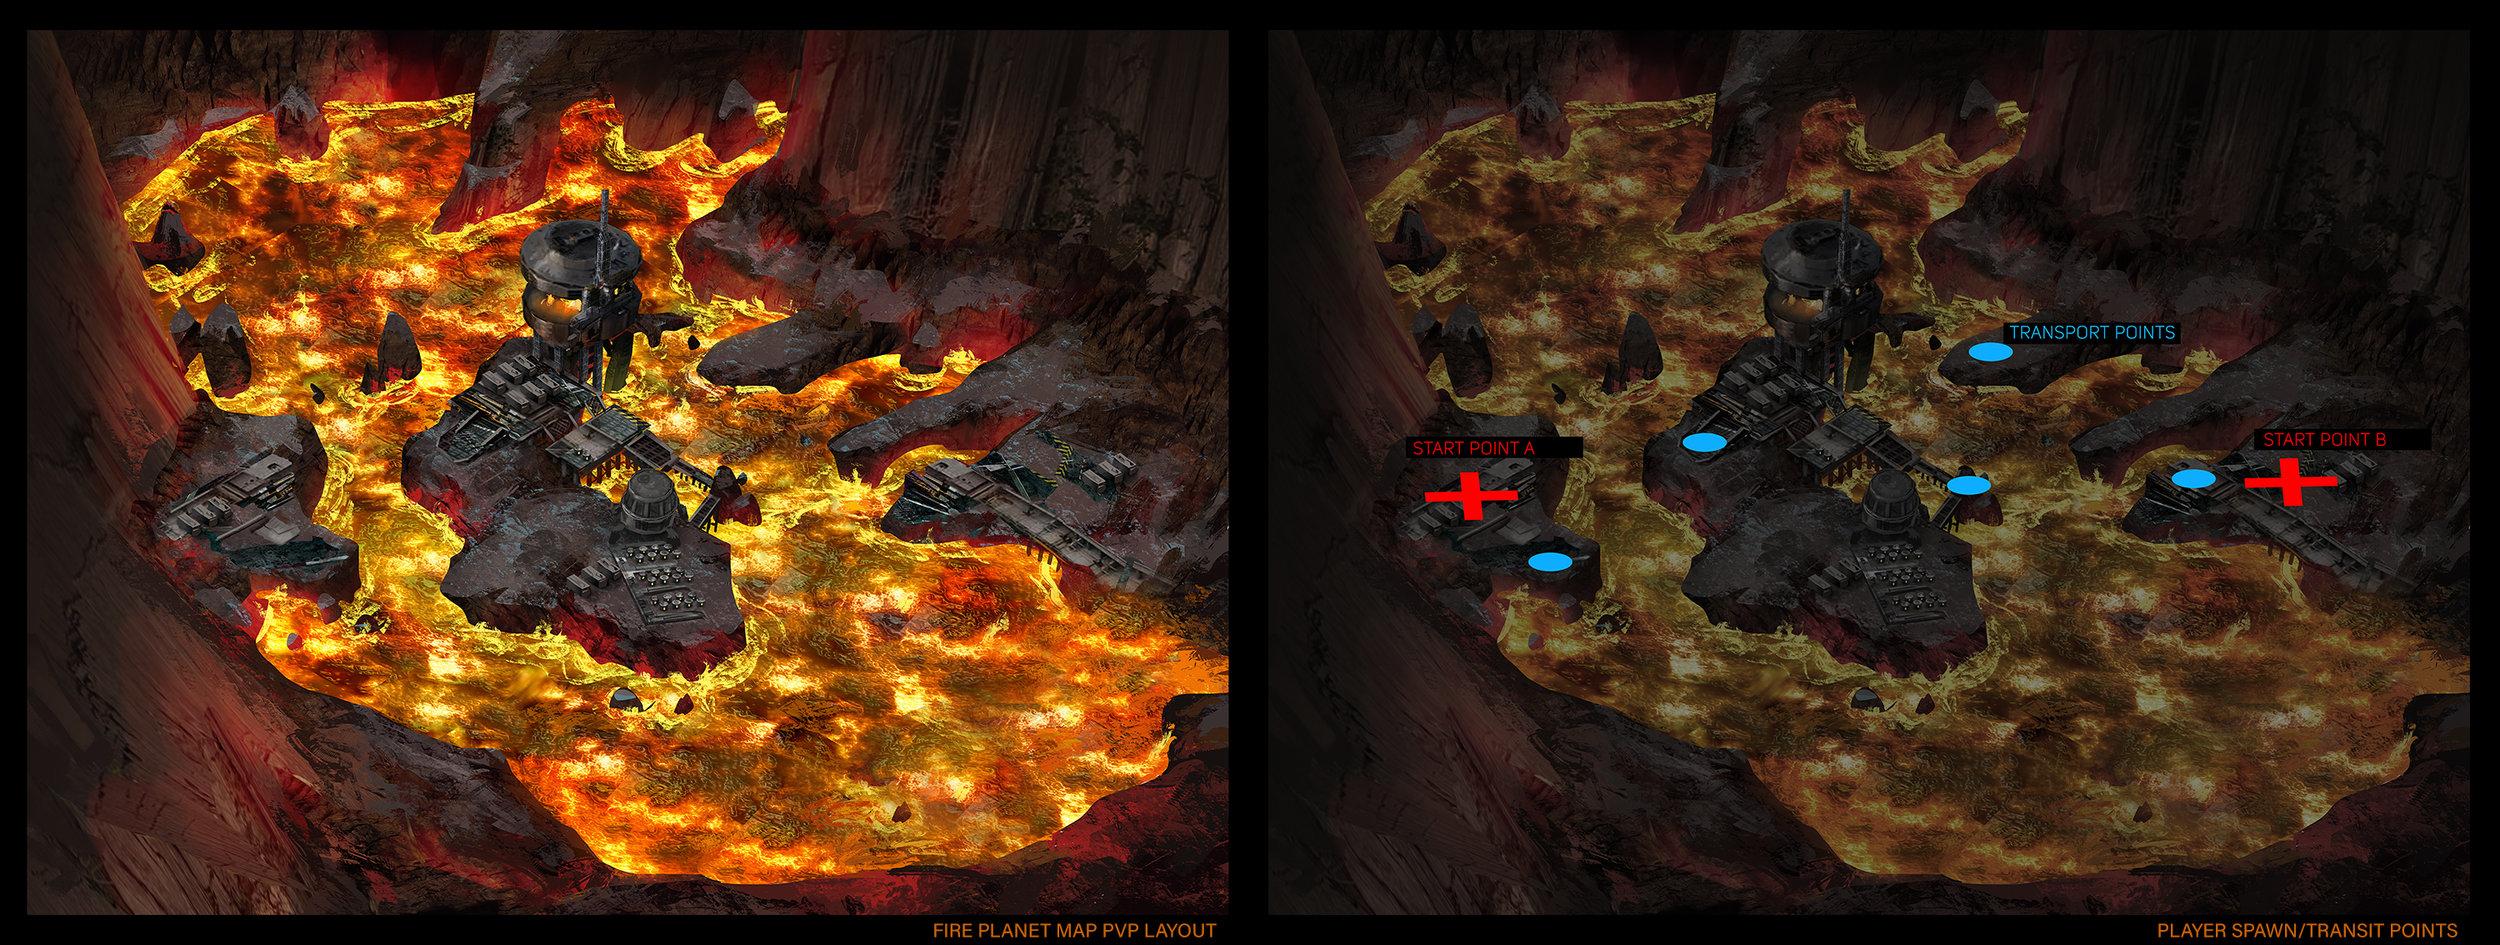 vr_fire-planet_map.jpg